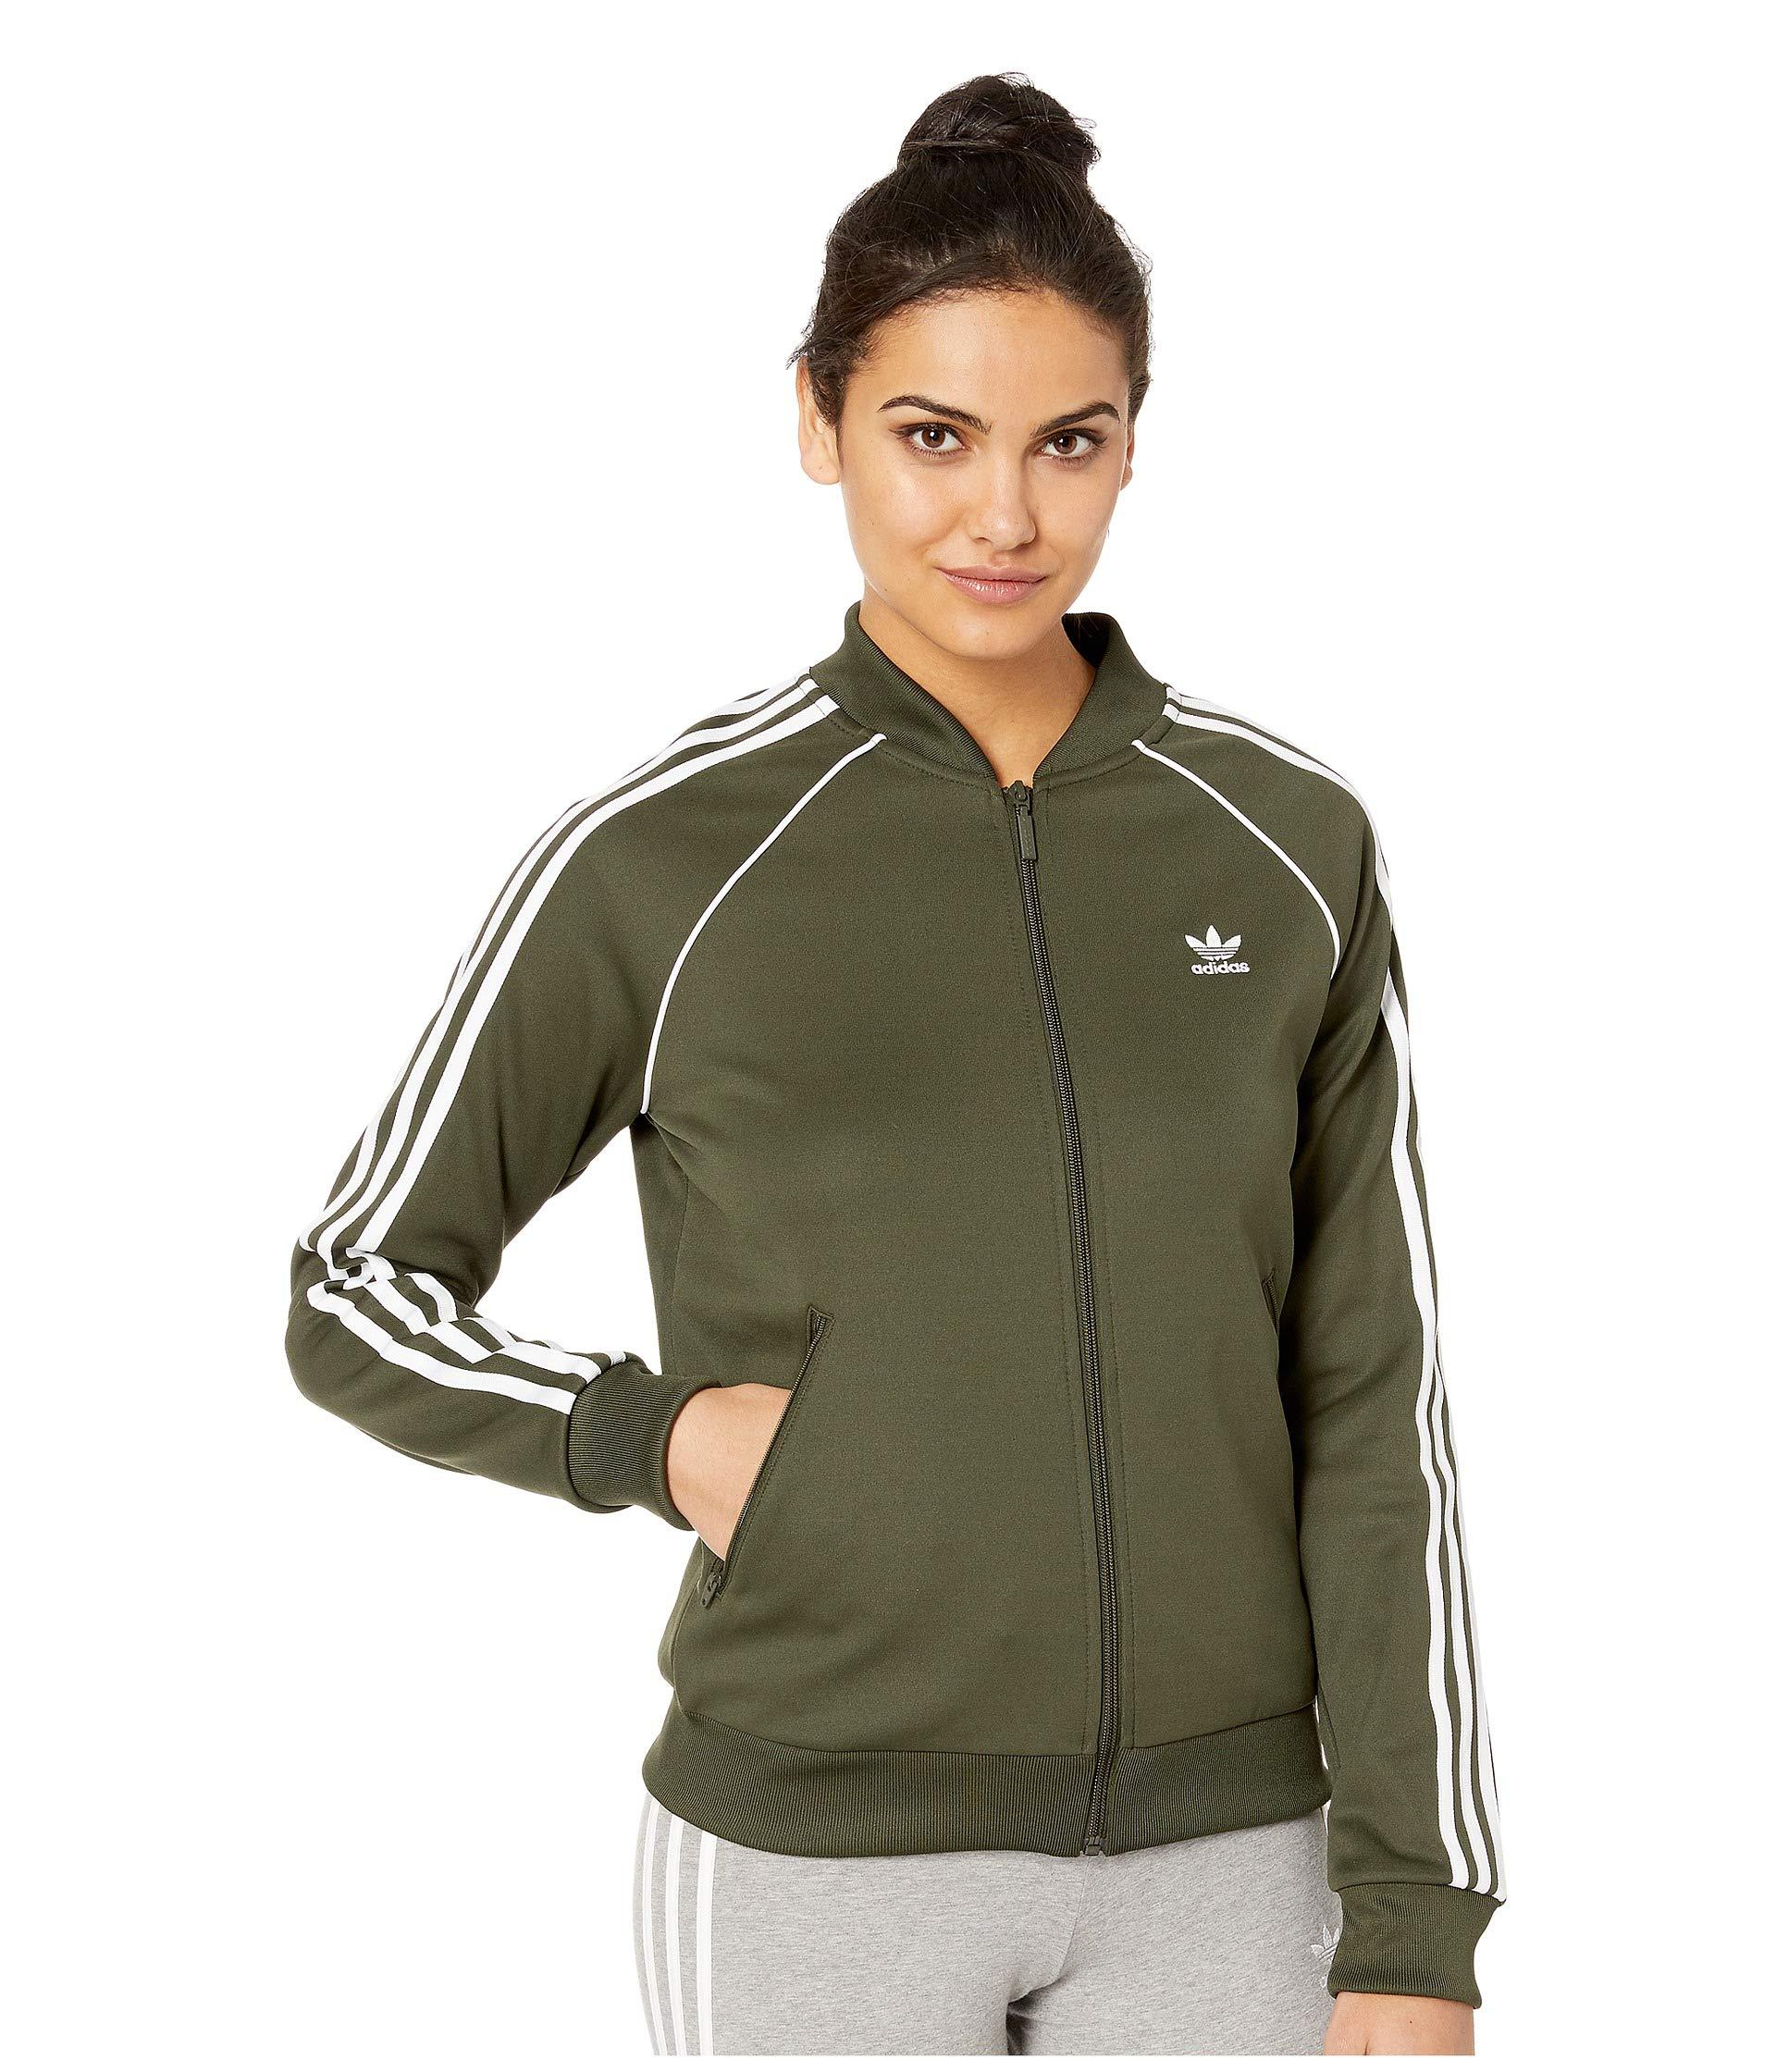 Lyst - adidas Originals Sst Track Jacket (dust Pink) Women s Coat in ... 79513a5571